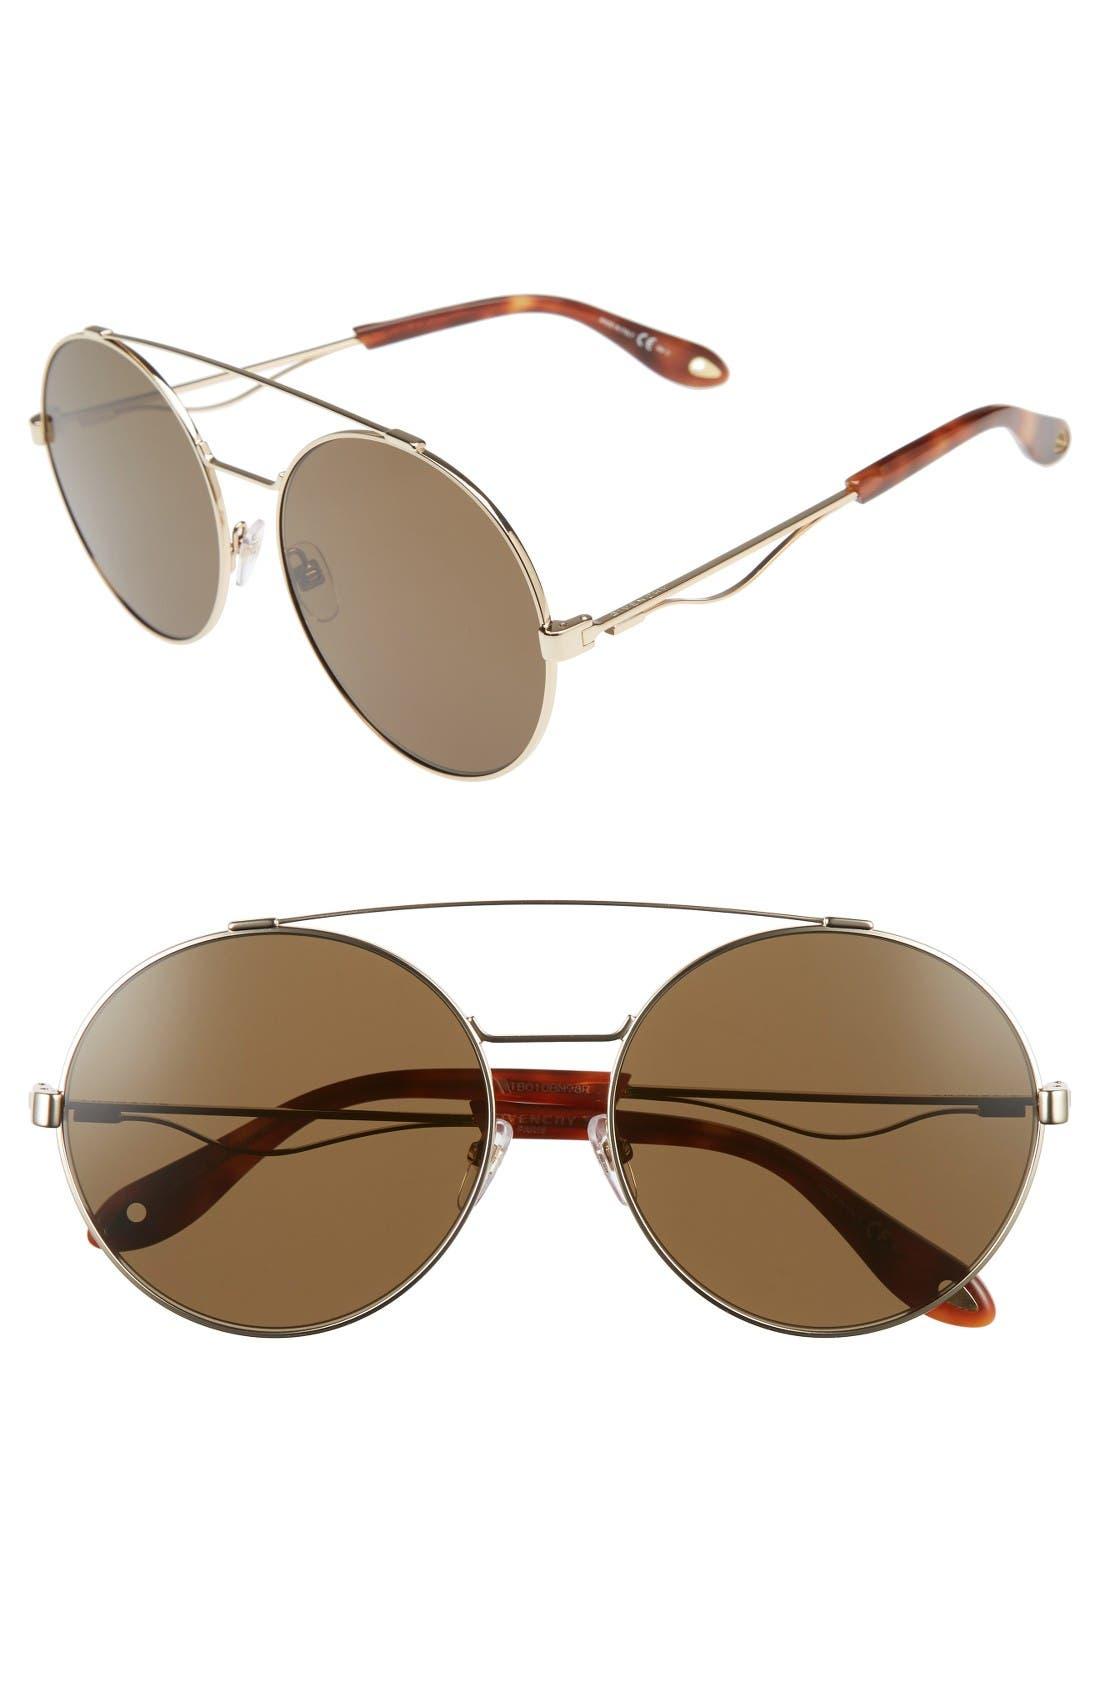 Main Image - Givenchy 62mm Round Sunglasses